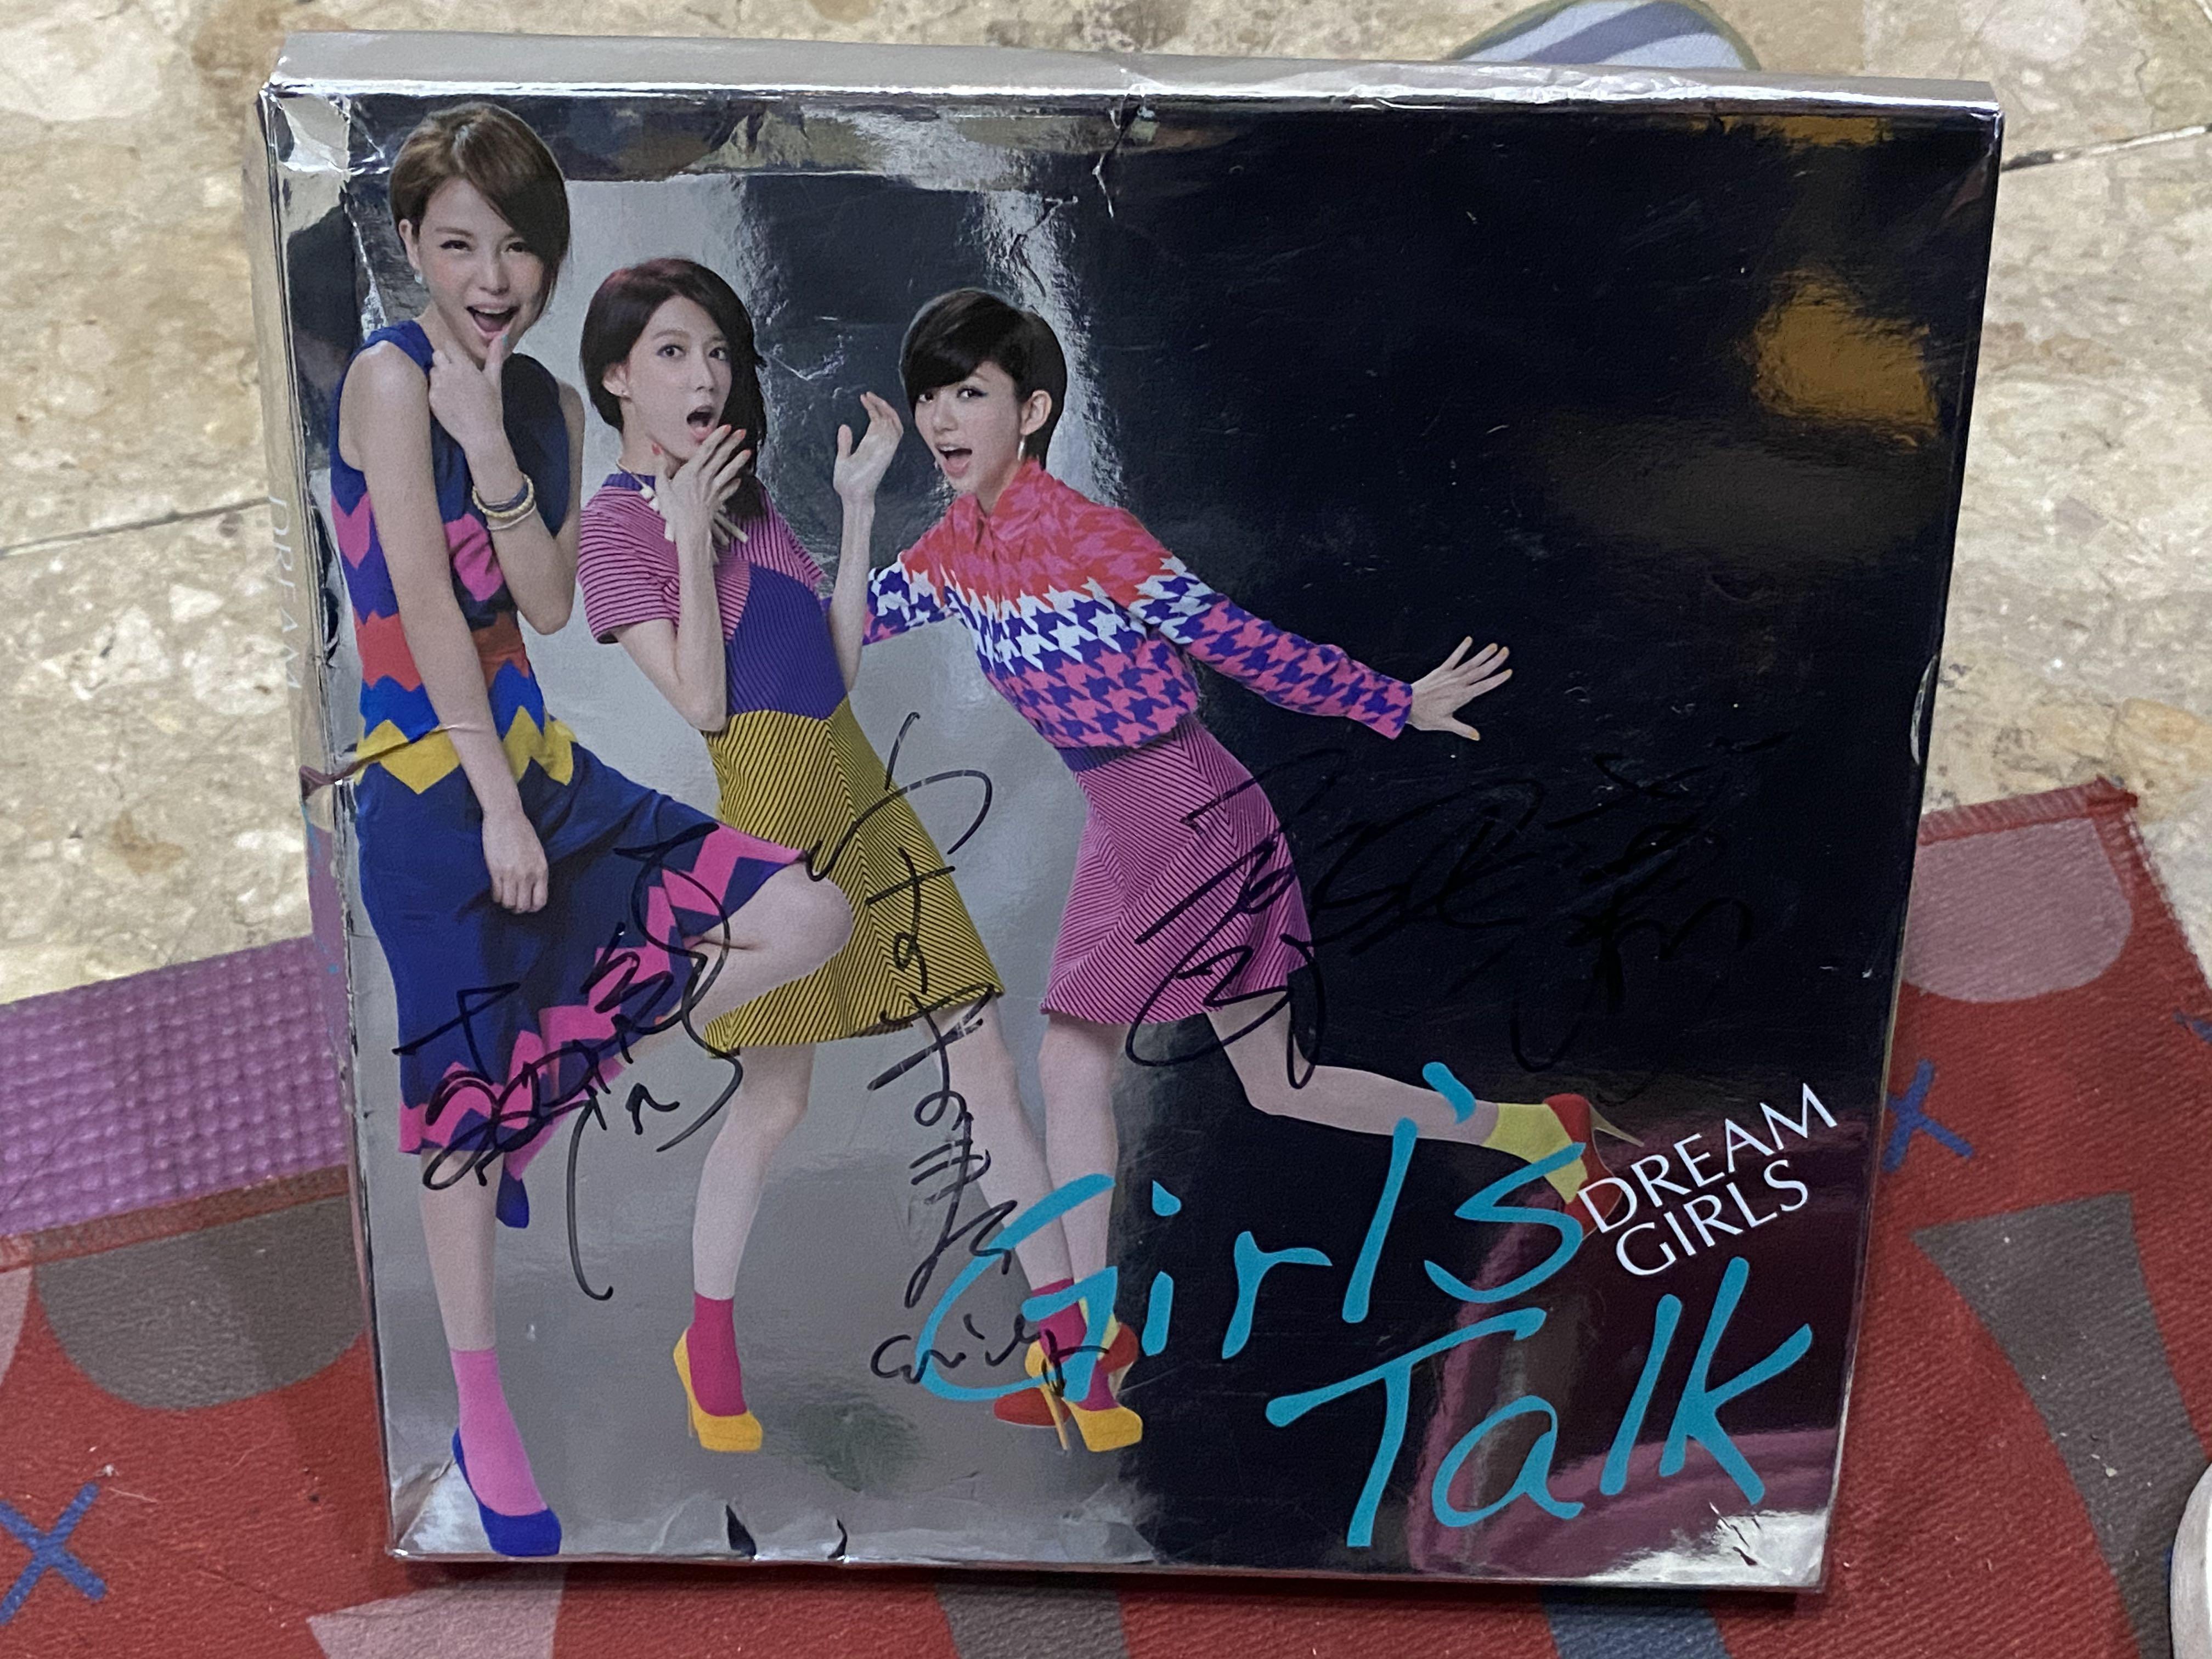 💜Dream Girls💜Girls Talk-3人親筆簽名CD